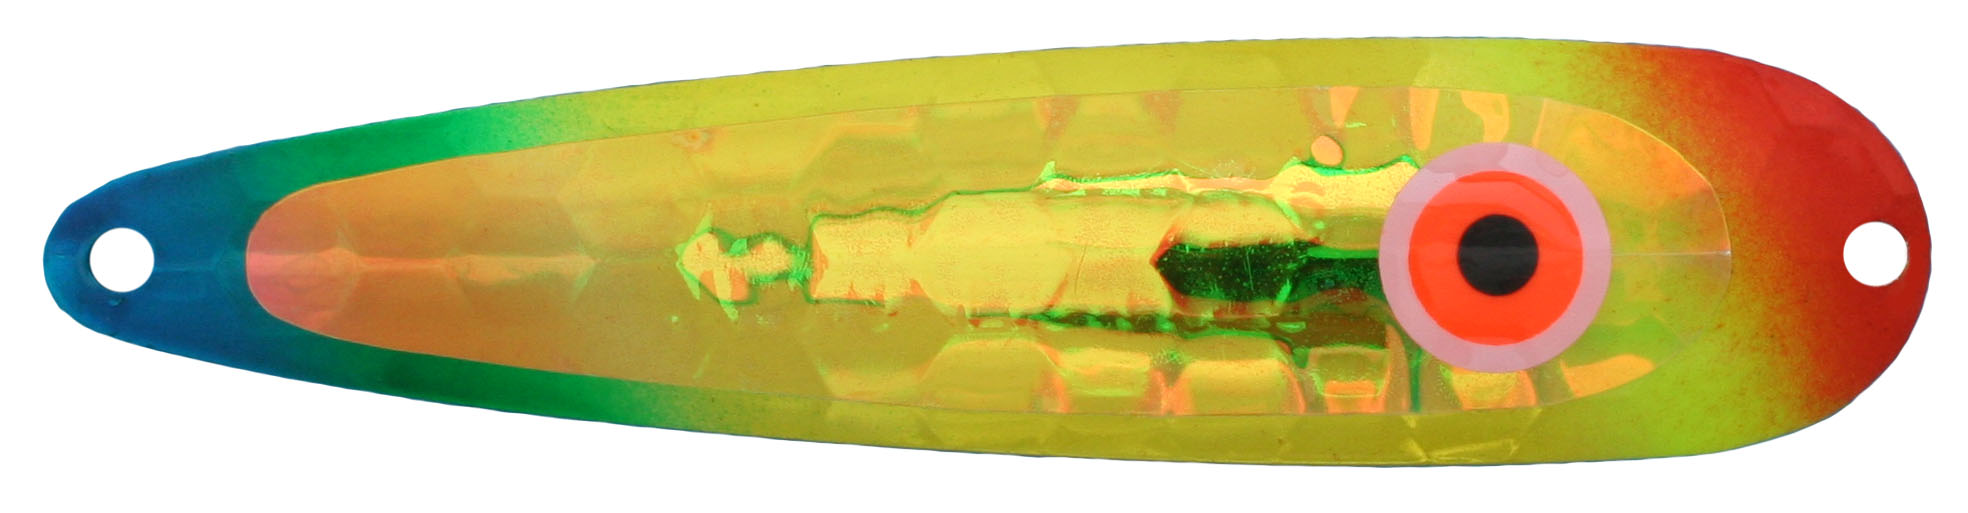 Silver streak spoons pg 3 for Solar lunar fishing